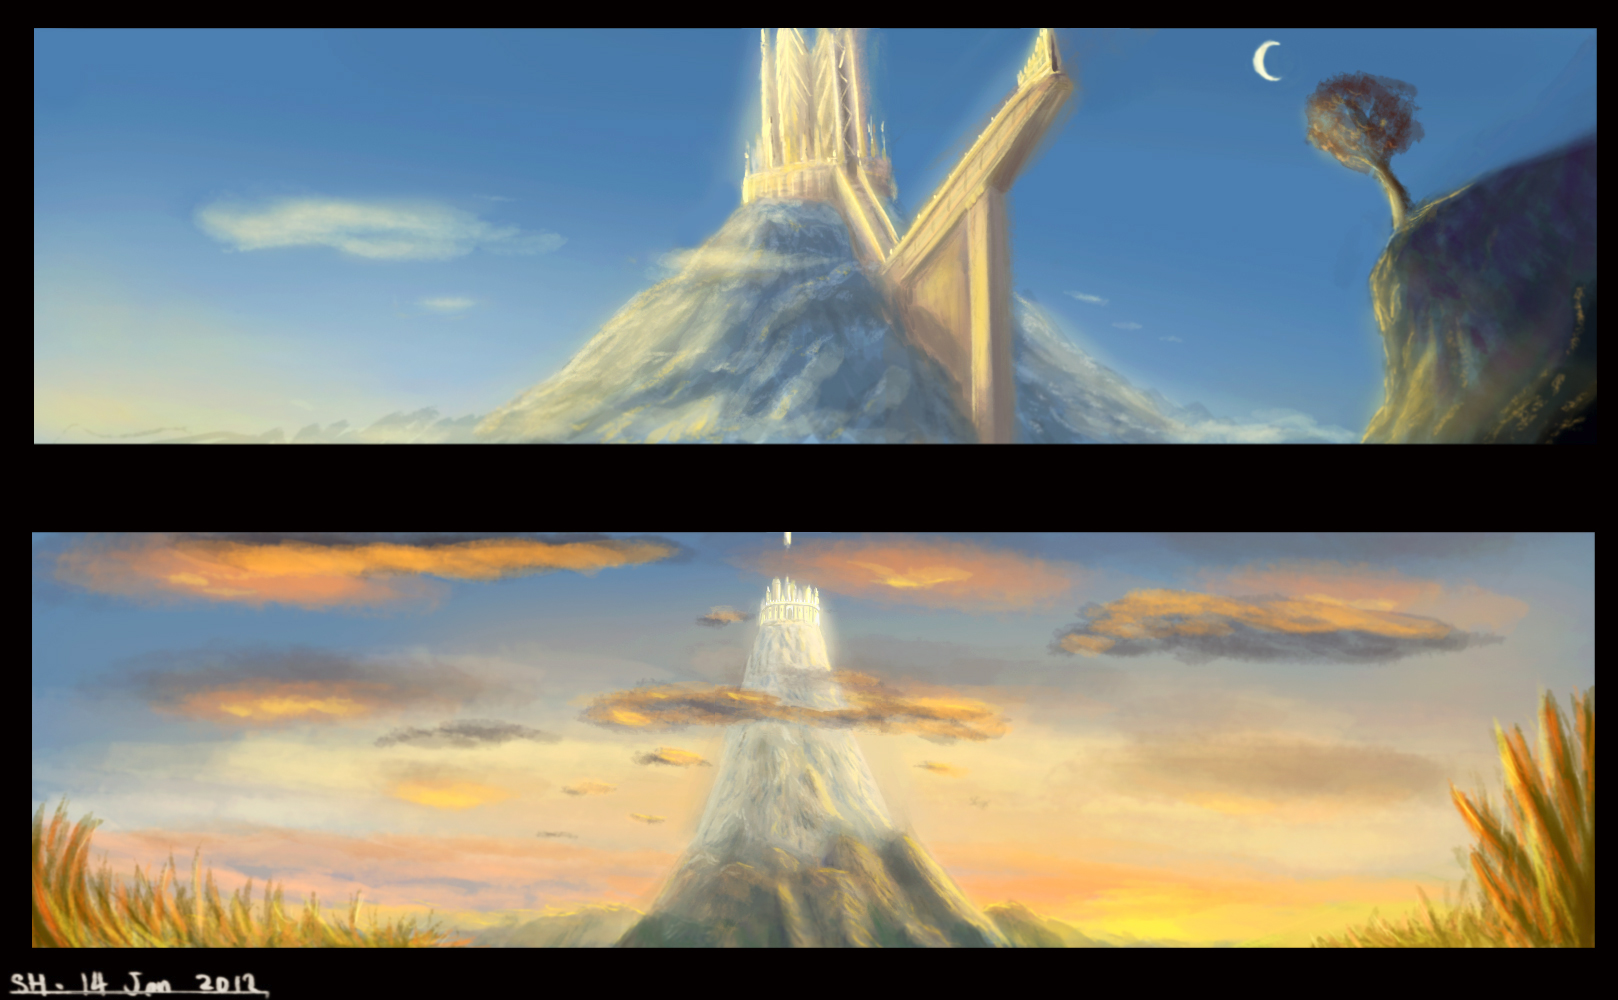 Sky palace by IRCSS